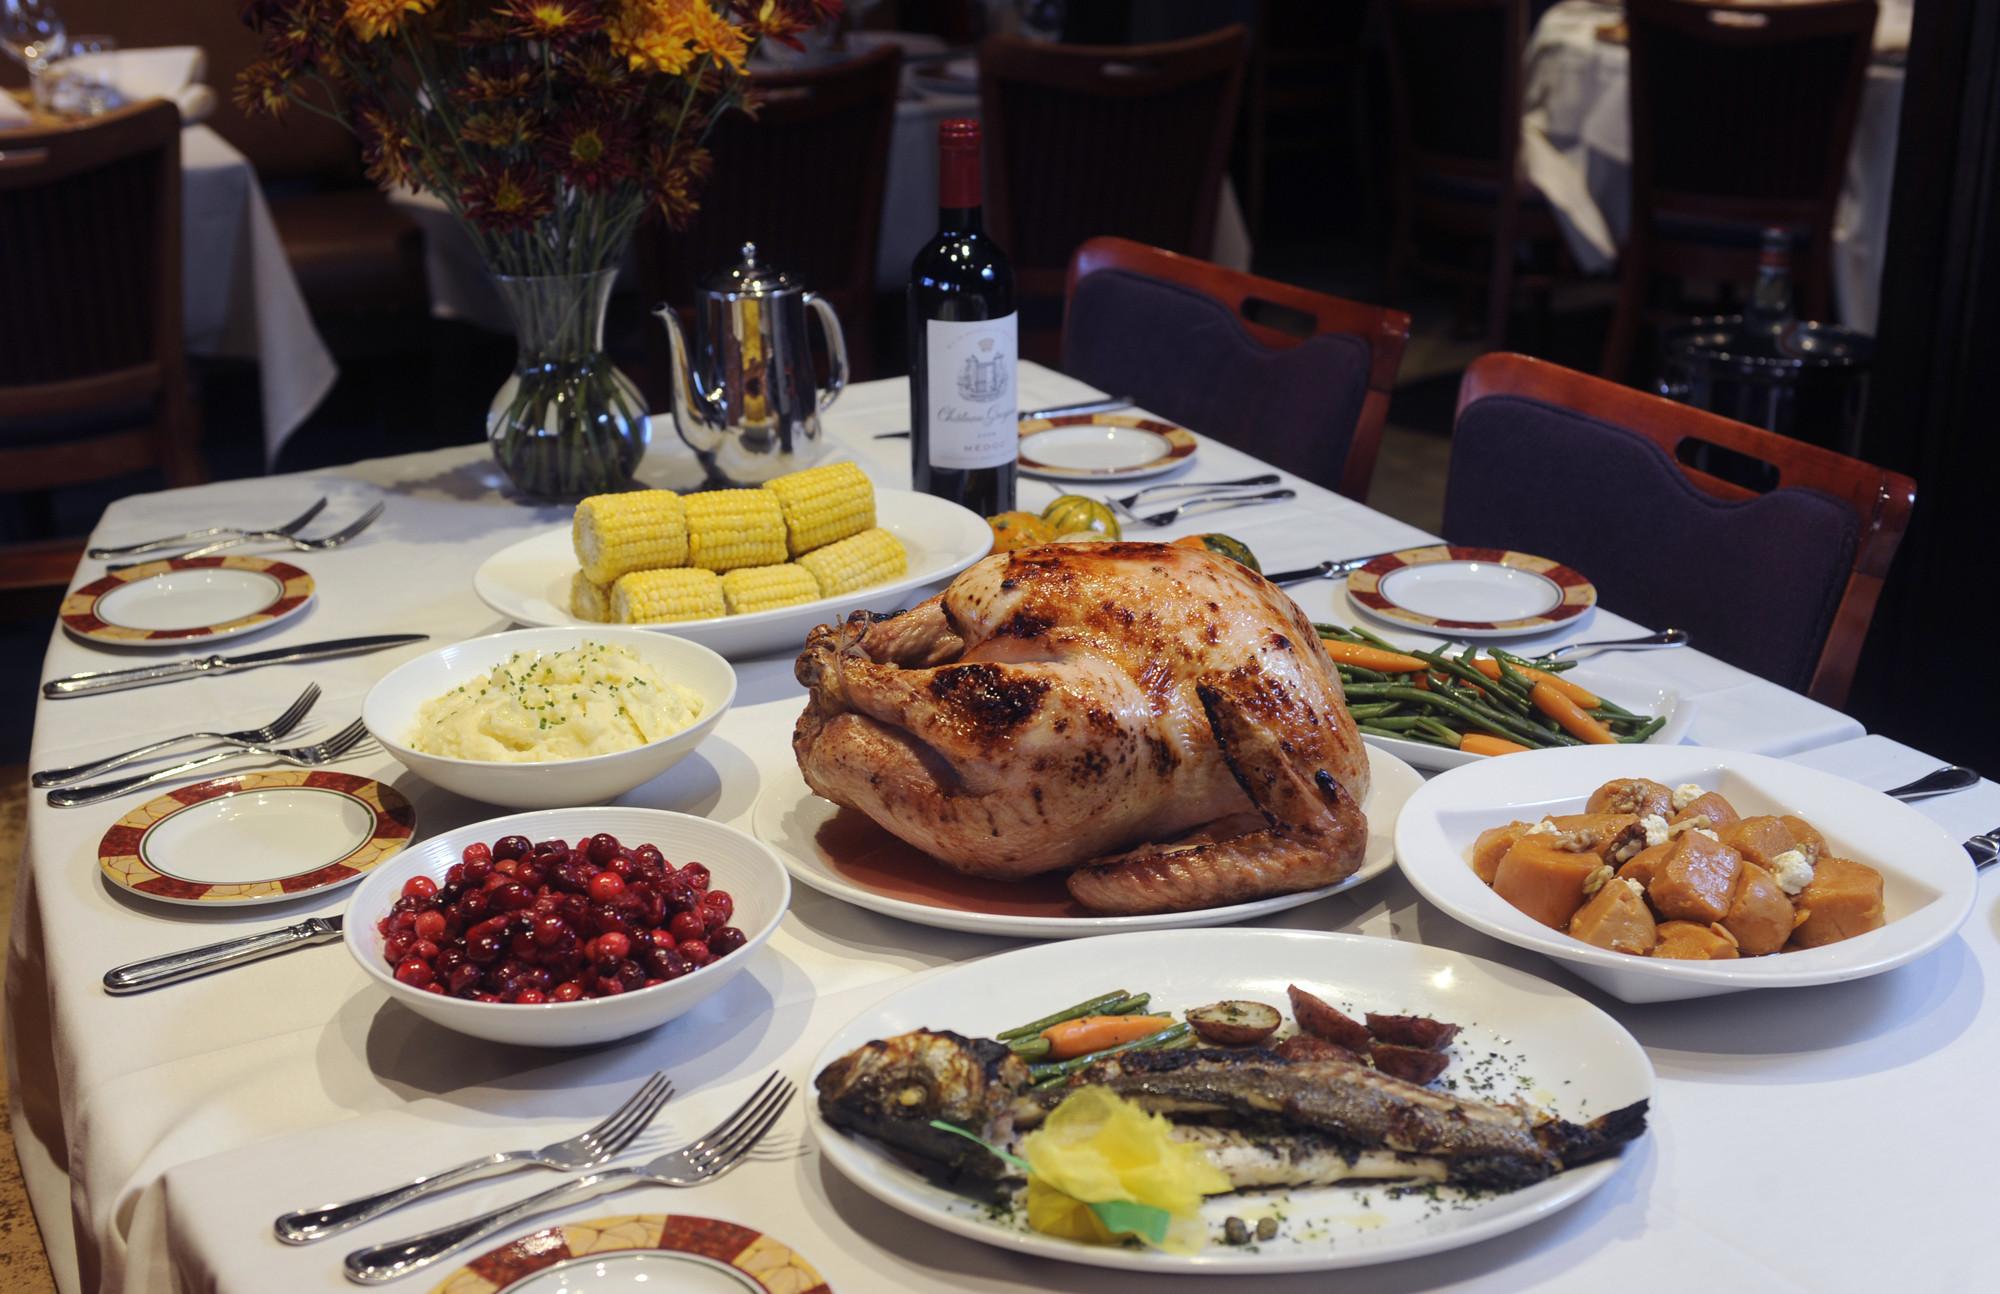 Thanksgiving Breakfast Restaurants  10 great Thanksgiving dishes at Baltimore restaurants